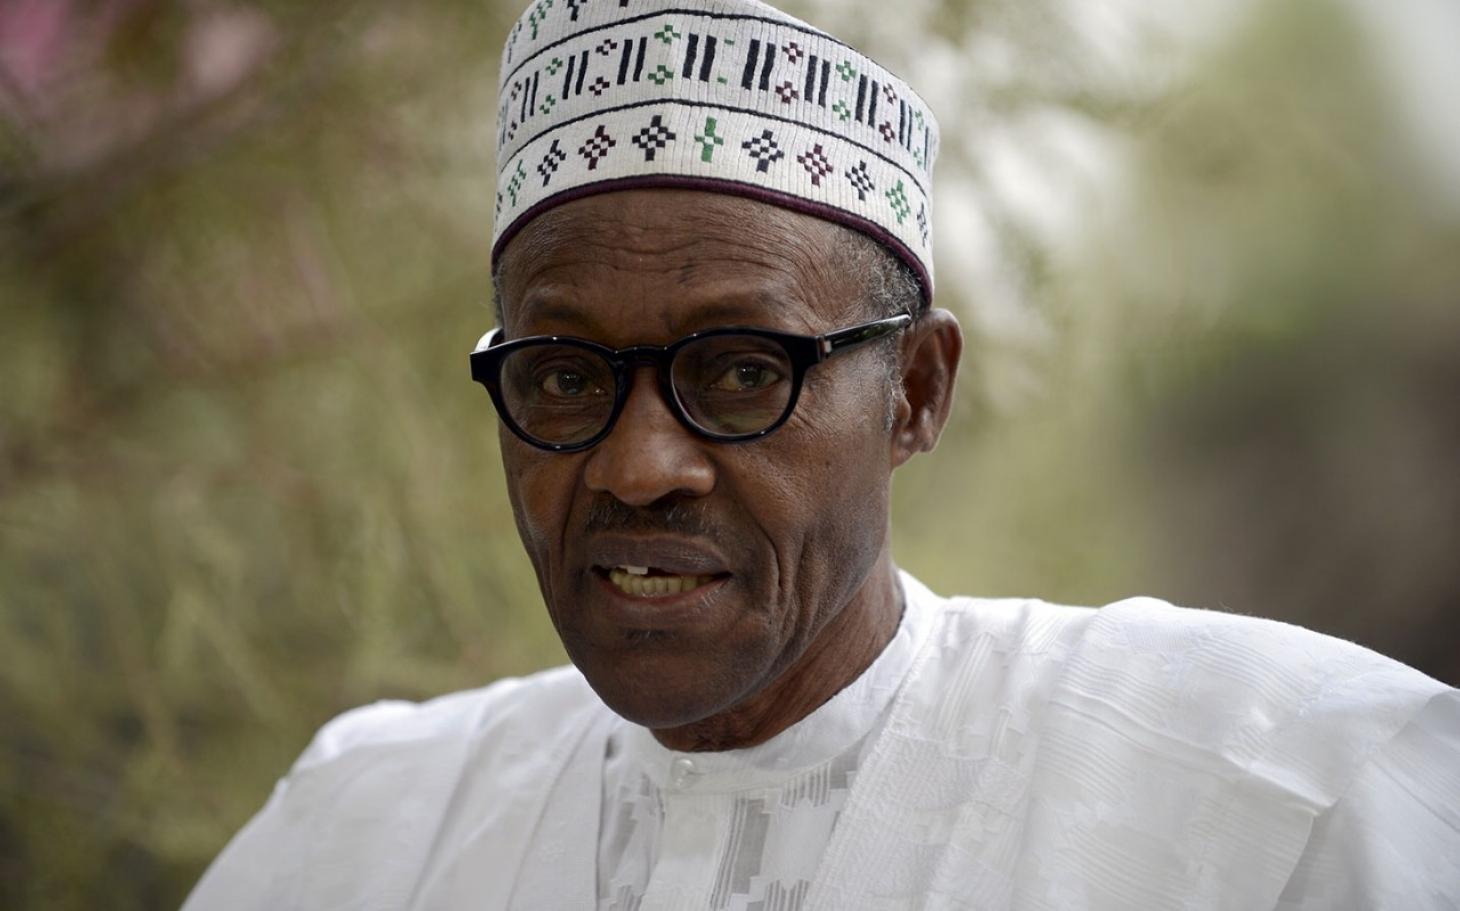 Buhari Takes Early Lead in Nigeria Vote | Al Jazeera America